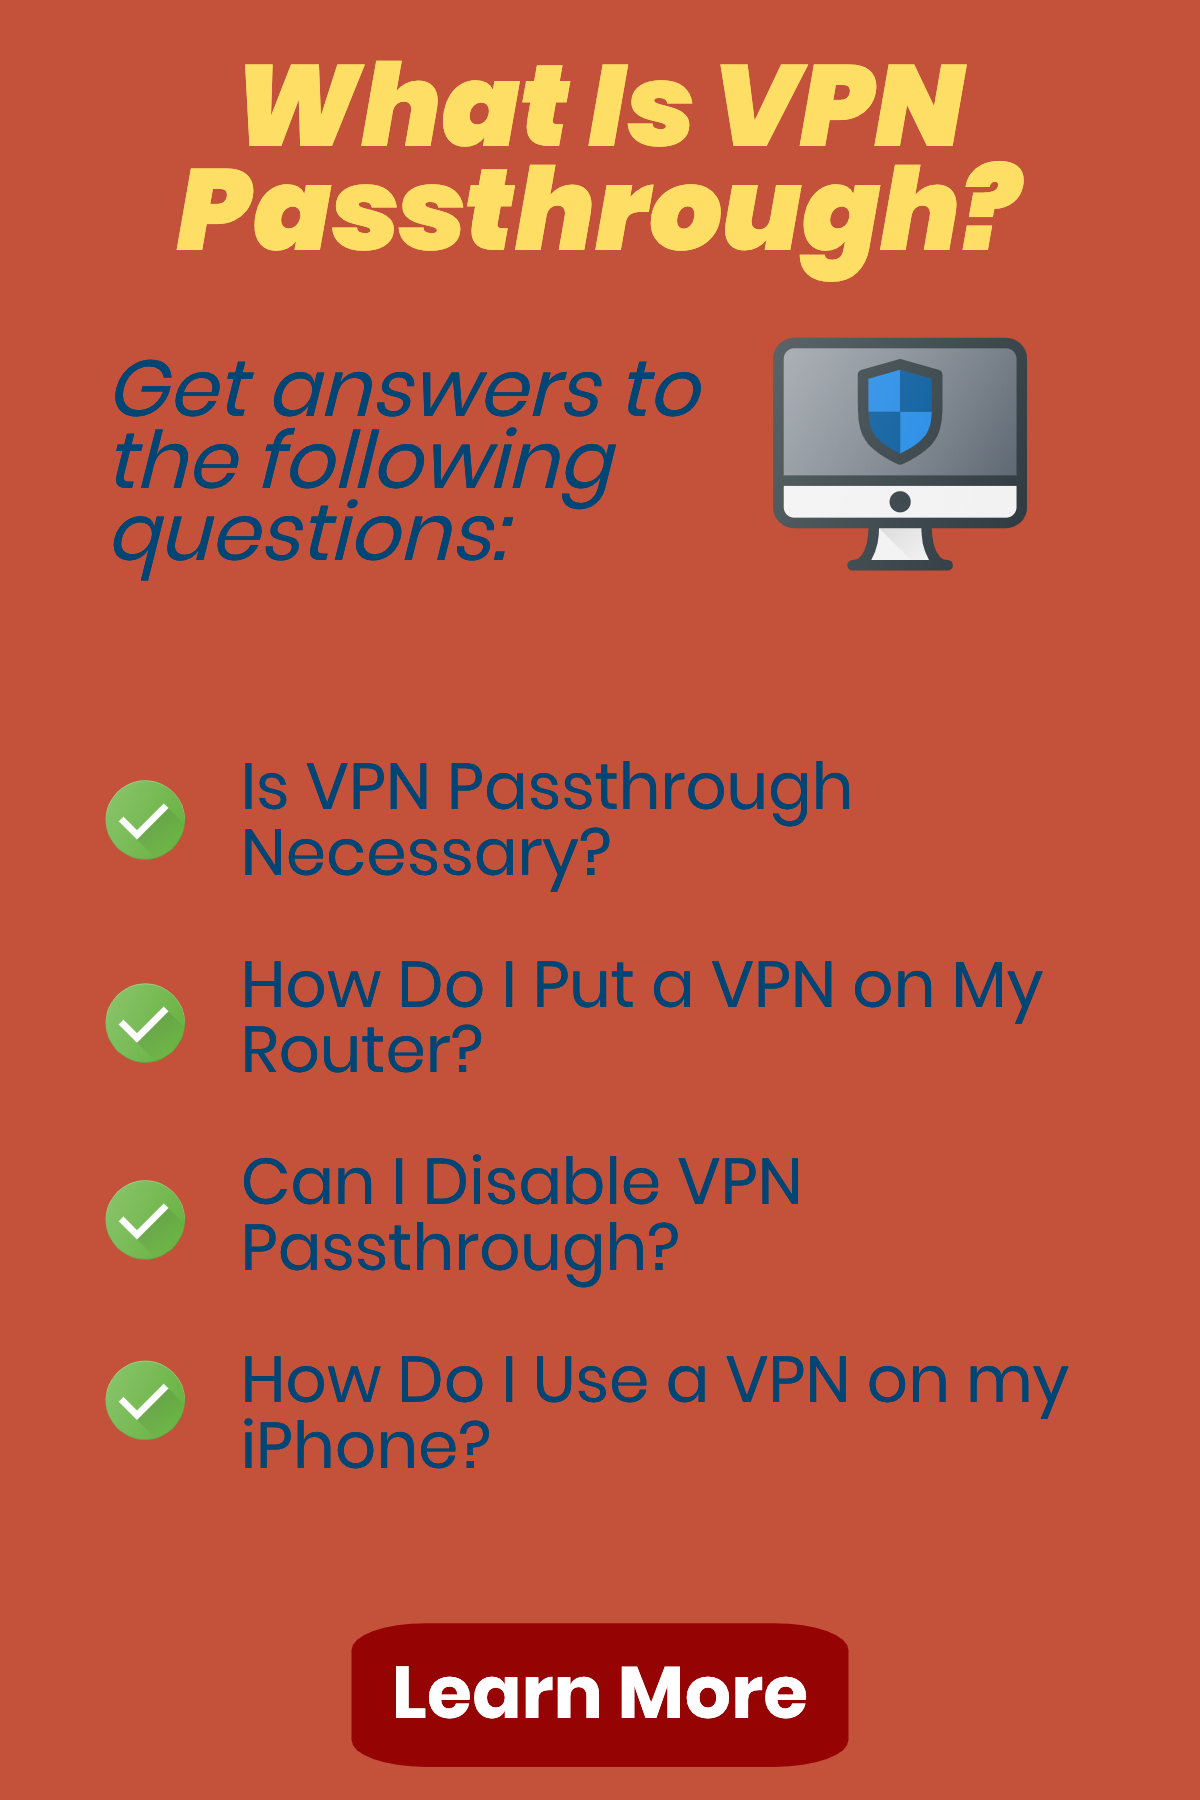 d14371601e3adf134bc0f04fdd4efc76 - How To Put A Vpn On My Router